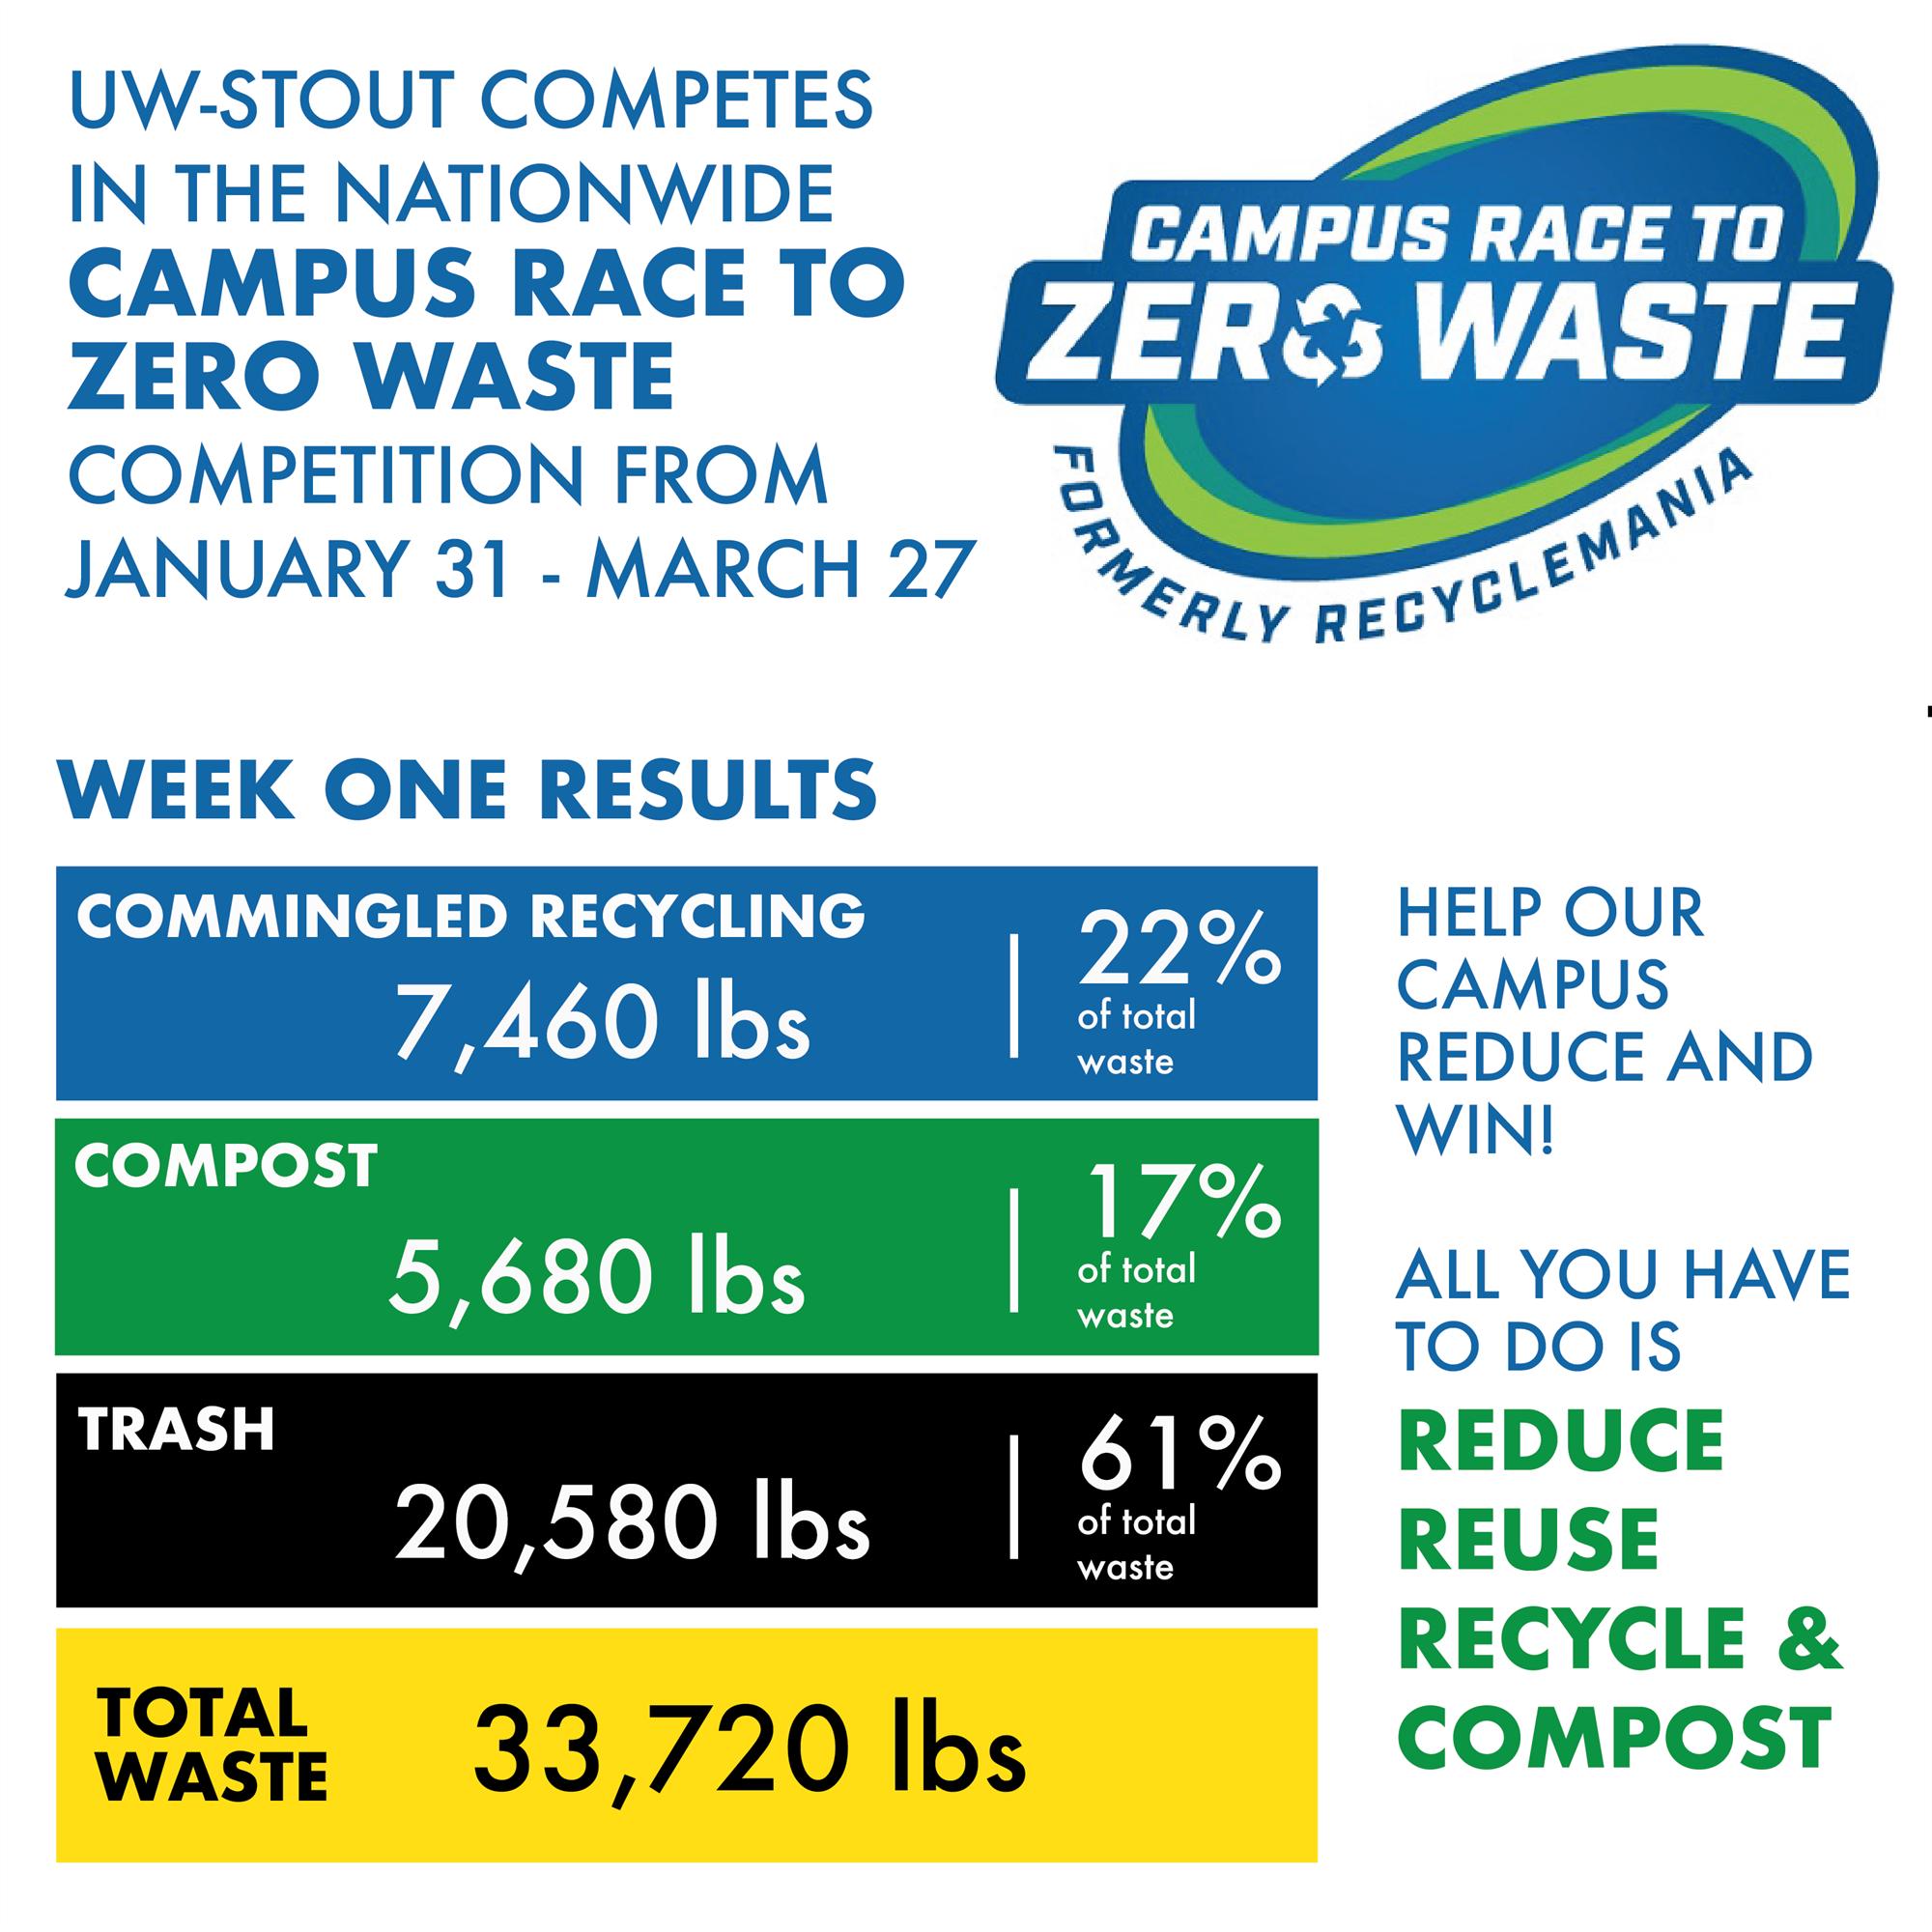 Race to Zero Waste